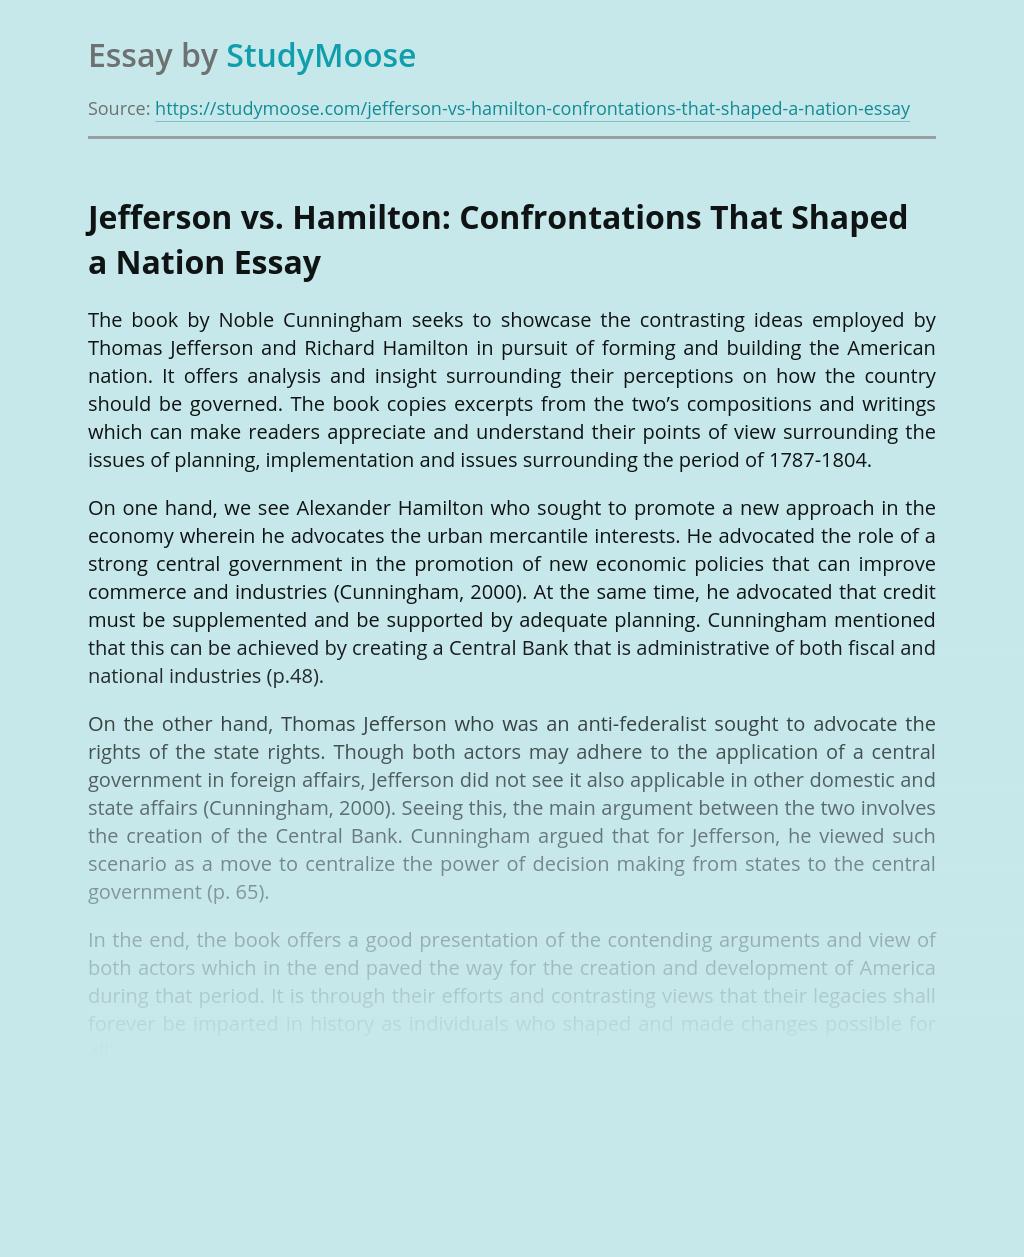 Jefferson vs. Hamilton: Confrontations That Shaped a Nation